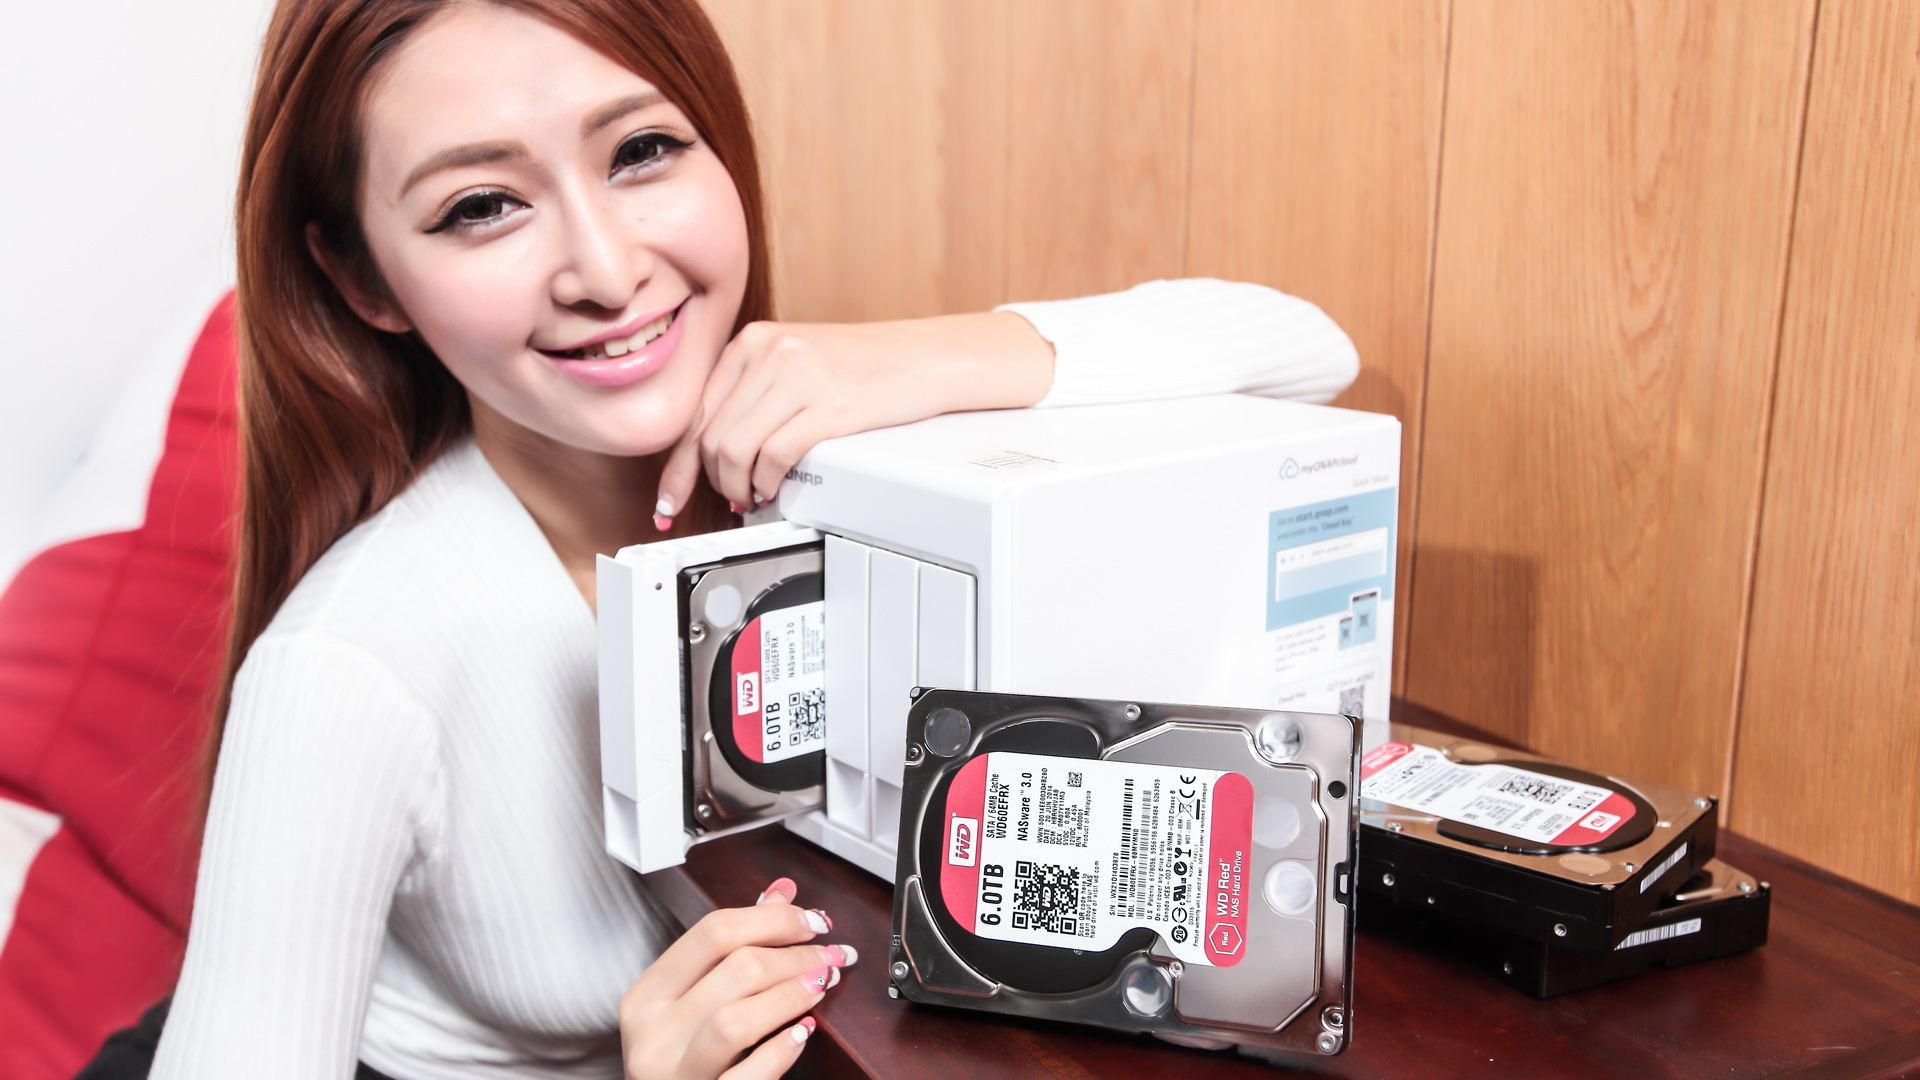 [XF] 為您的NAS系統挑選最佳戰友吧 WD Red 系列硬碟適才適所發揮絕佳效益